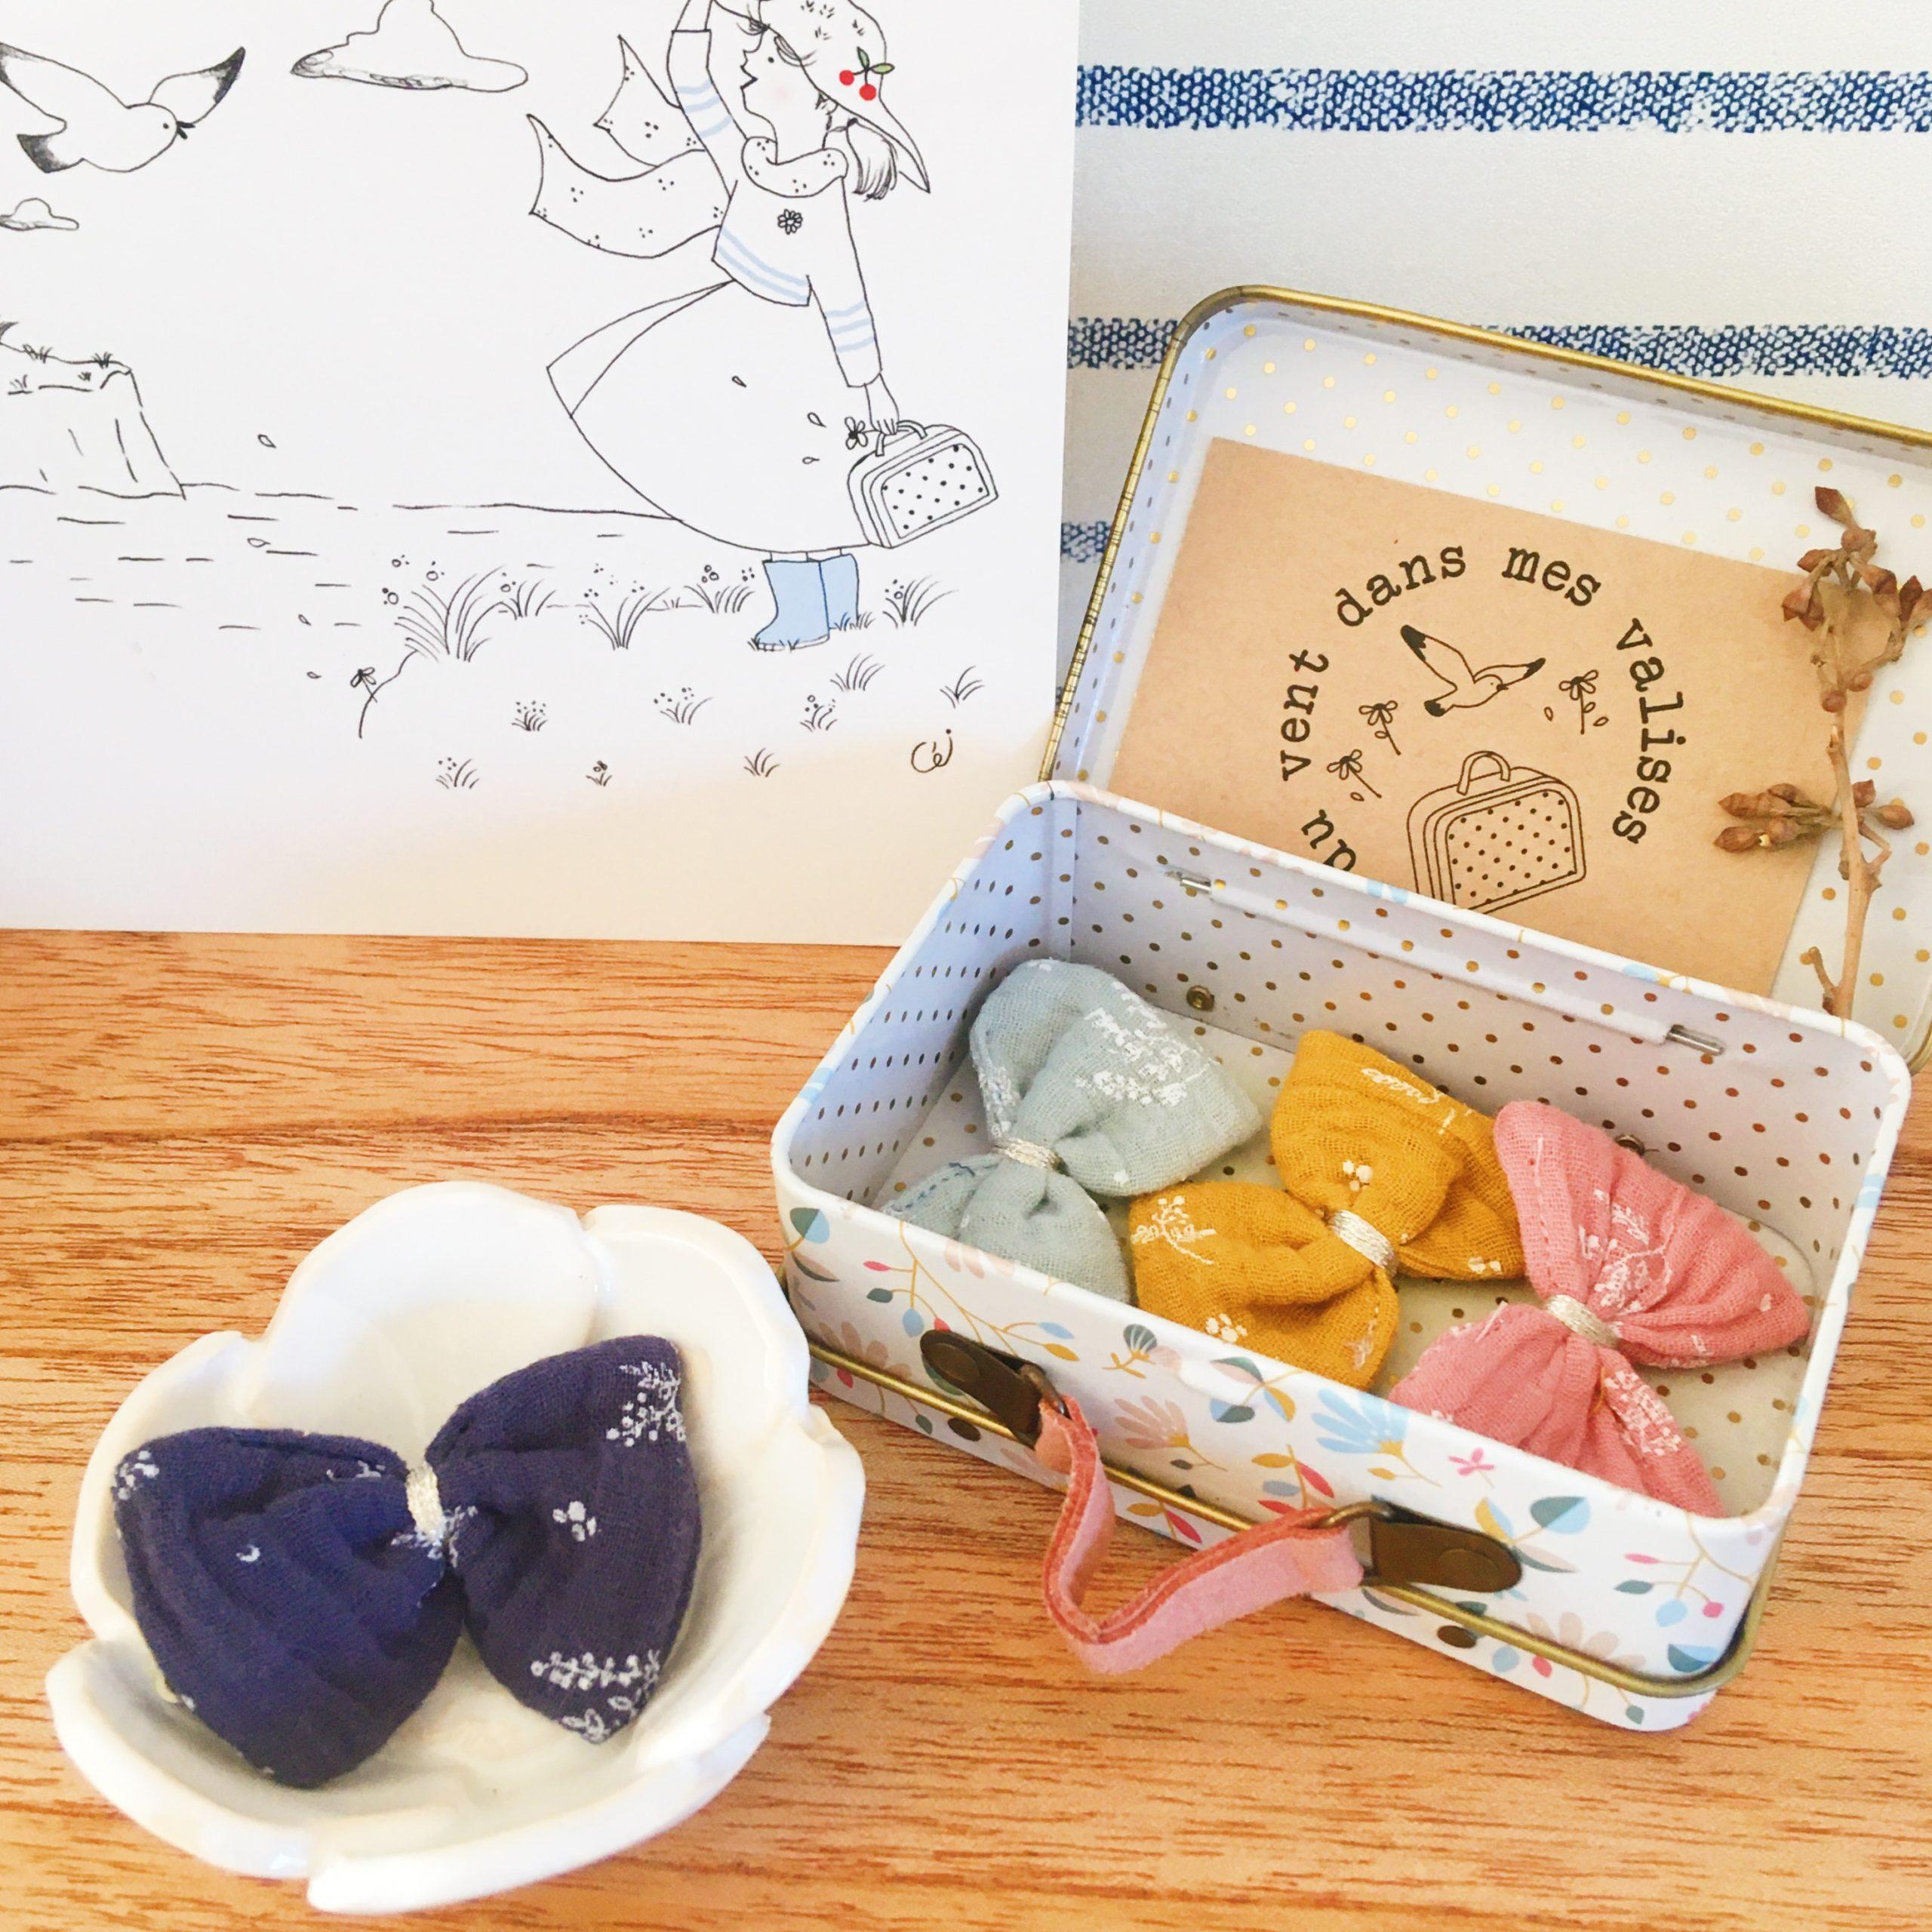 barrettes fillettes made in france noeud en double gaze motifs végétal bleu marine - du vent dans mes valises